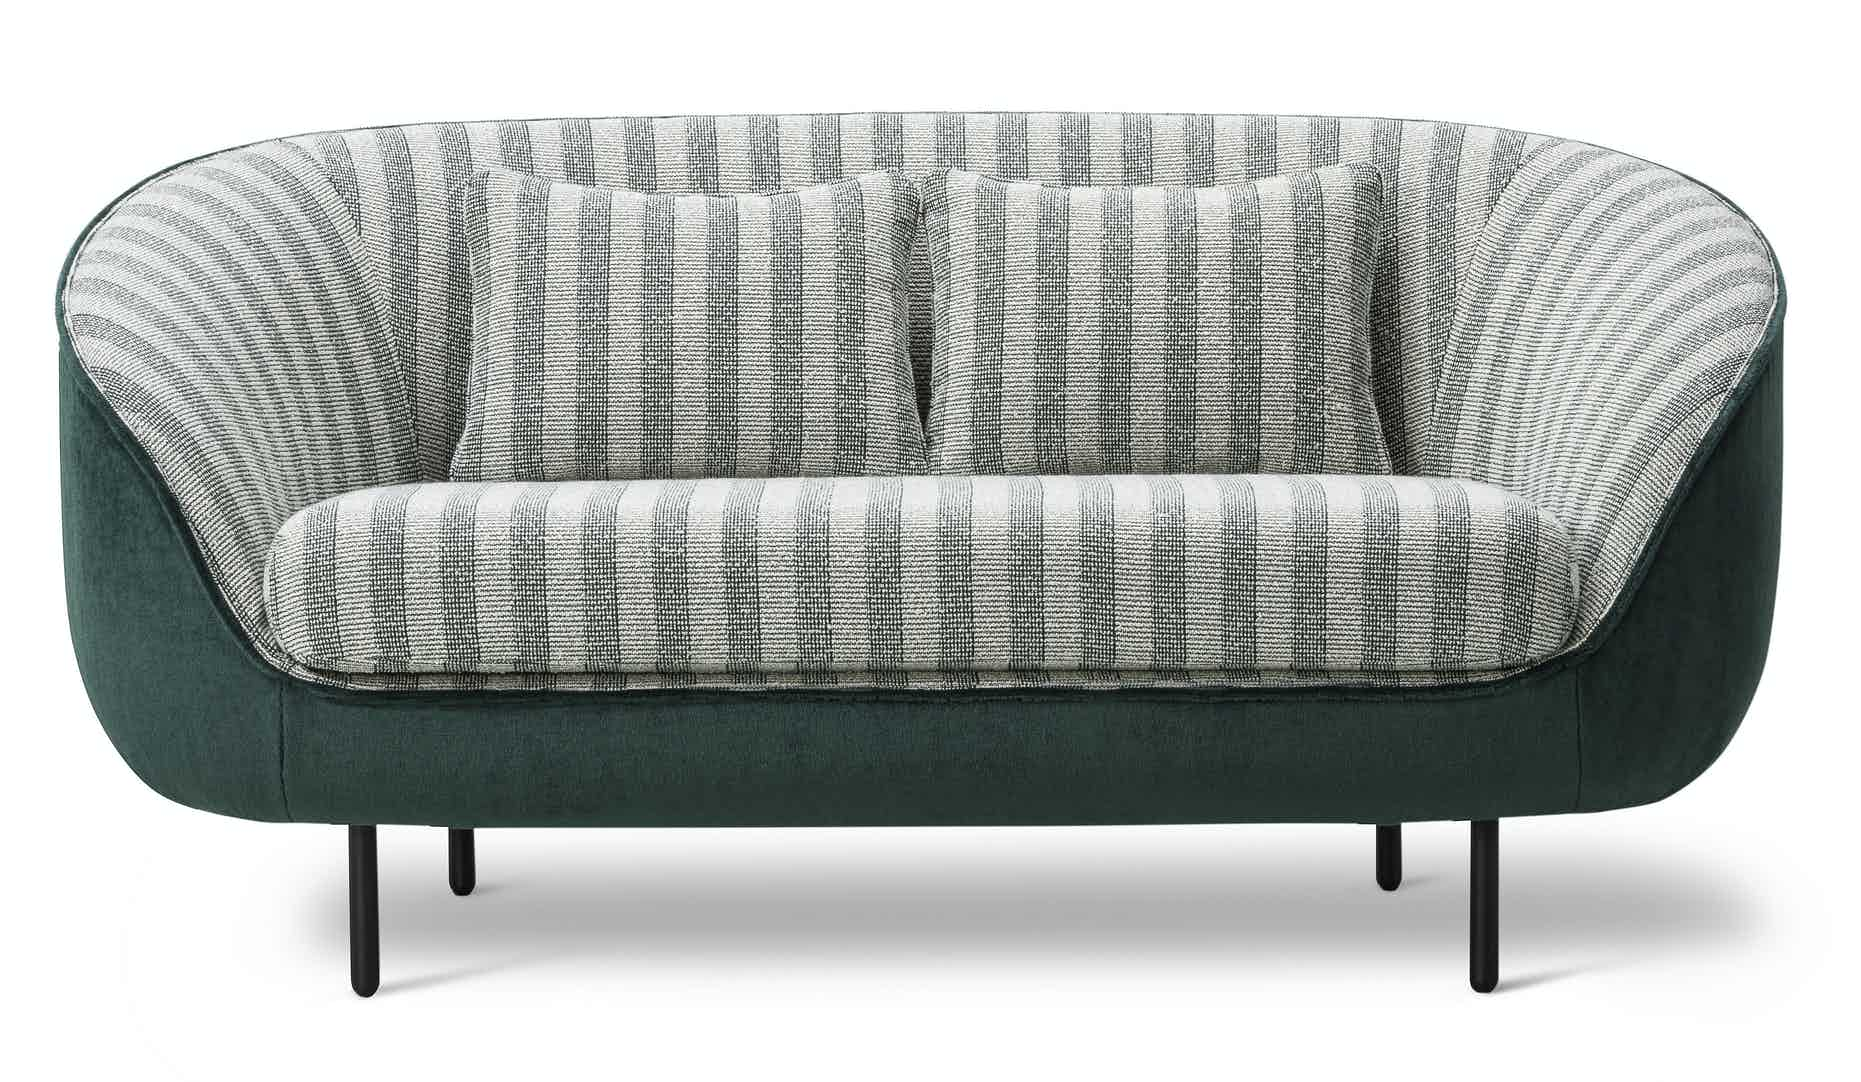 Fredericia Furniture Haiku 2 Seat Front Striped Haute Living